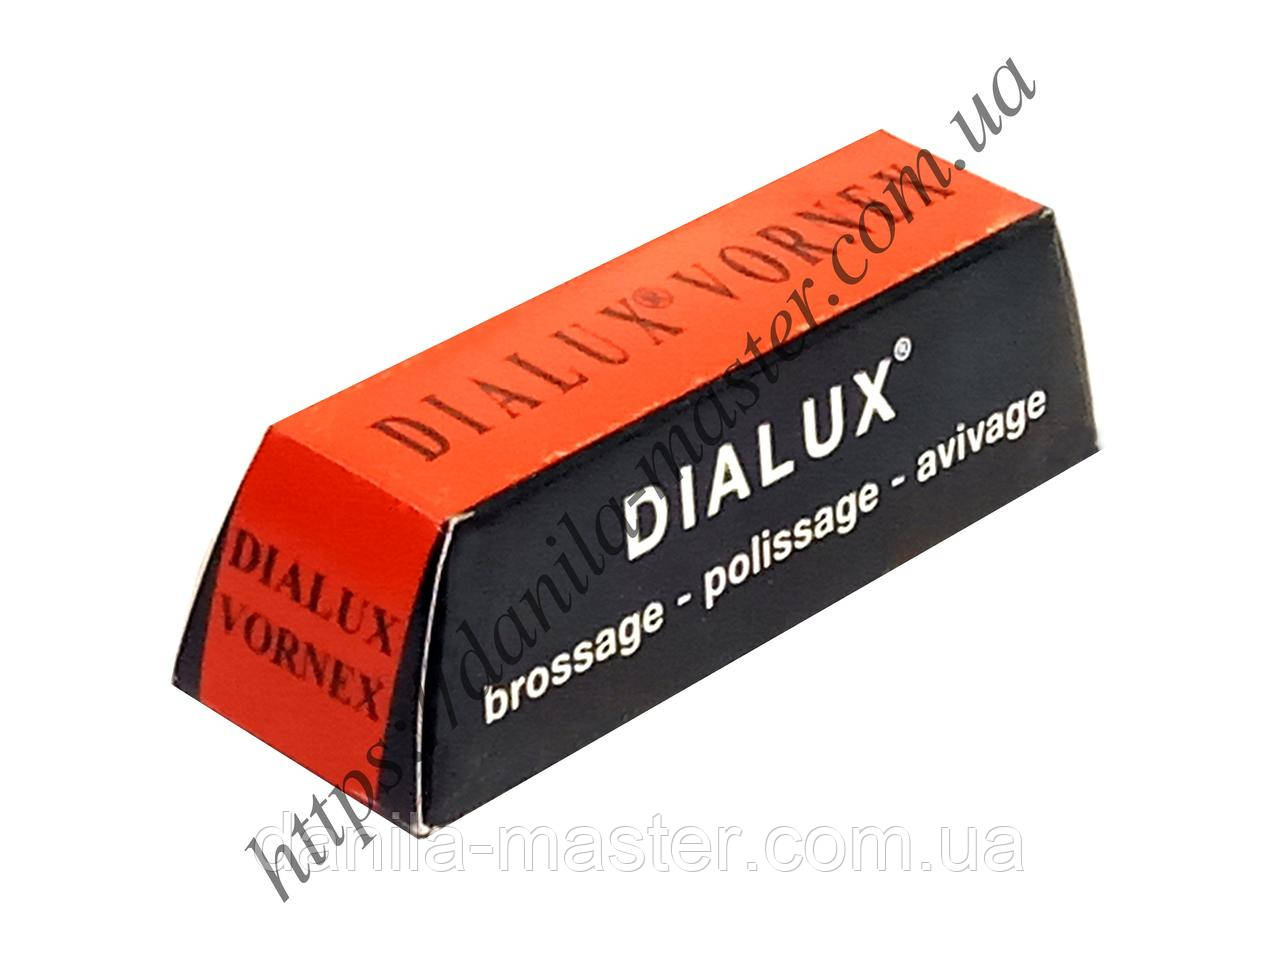 DIALUX полірувальна паста помаранчева